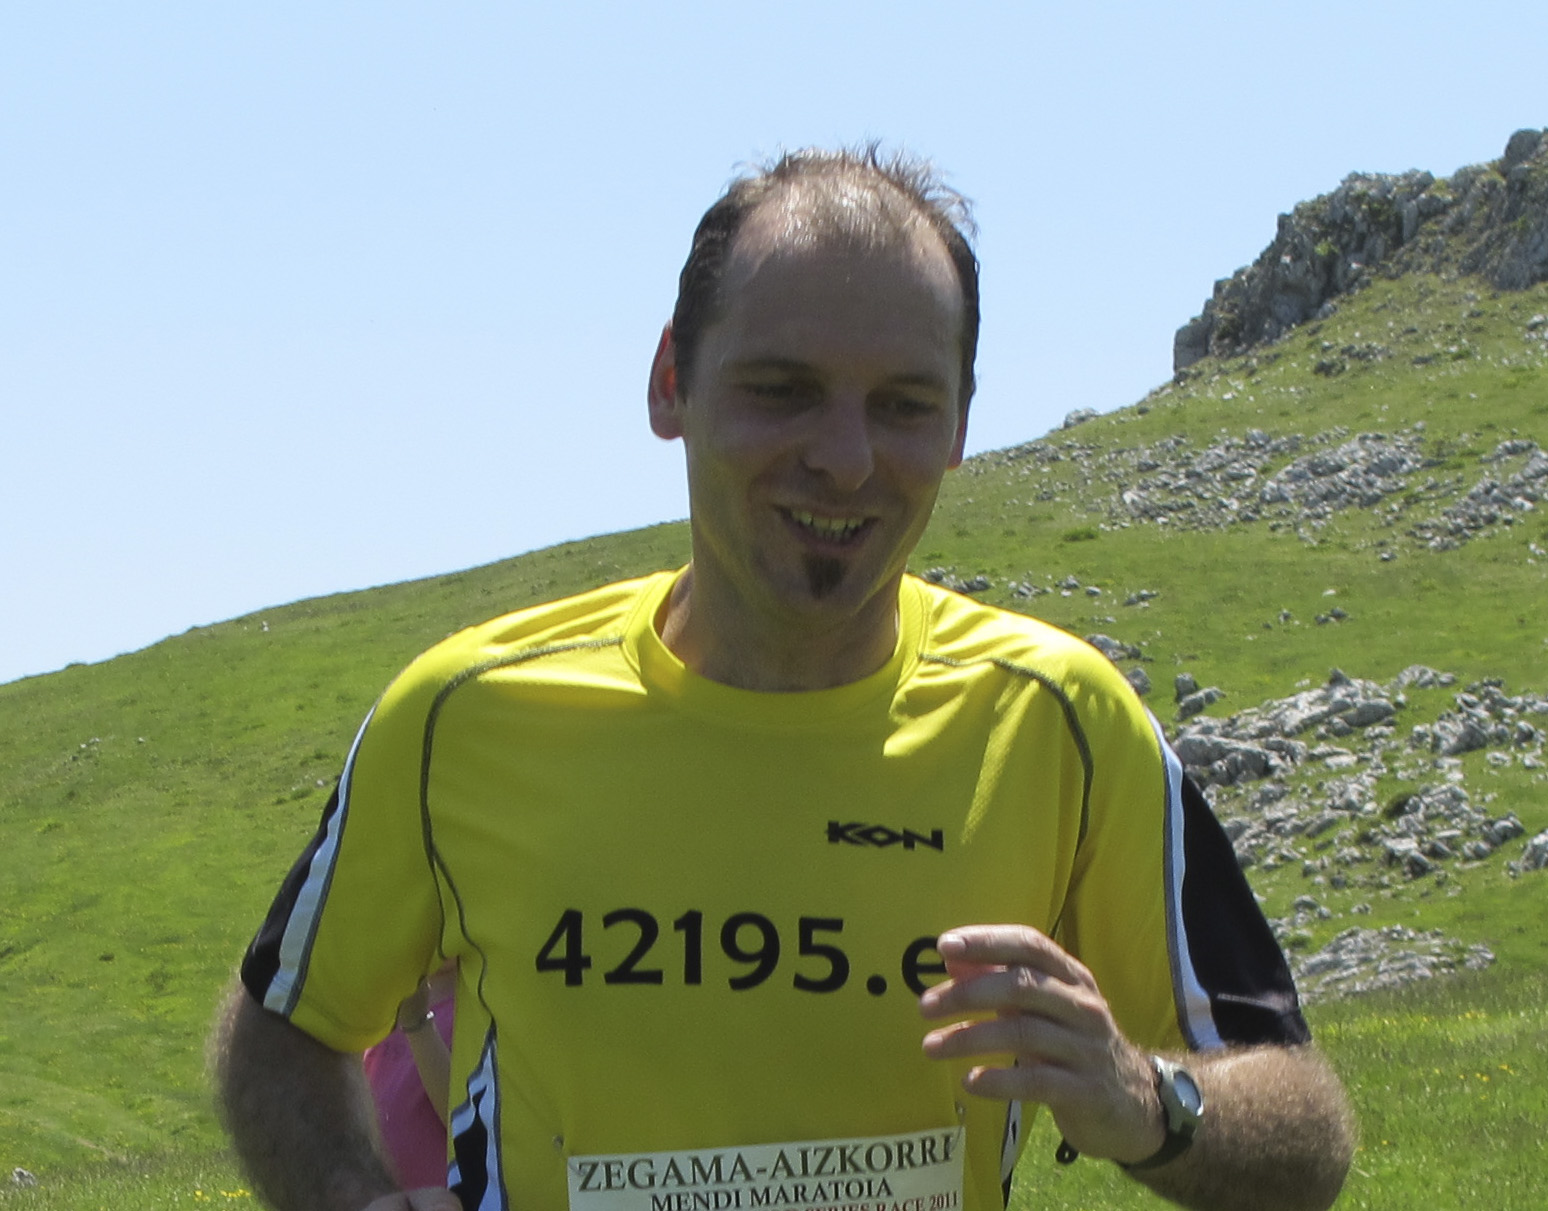 Jungfrau STERNde